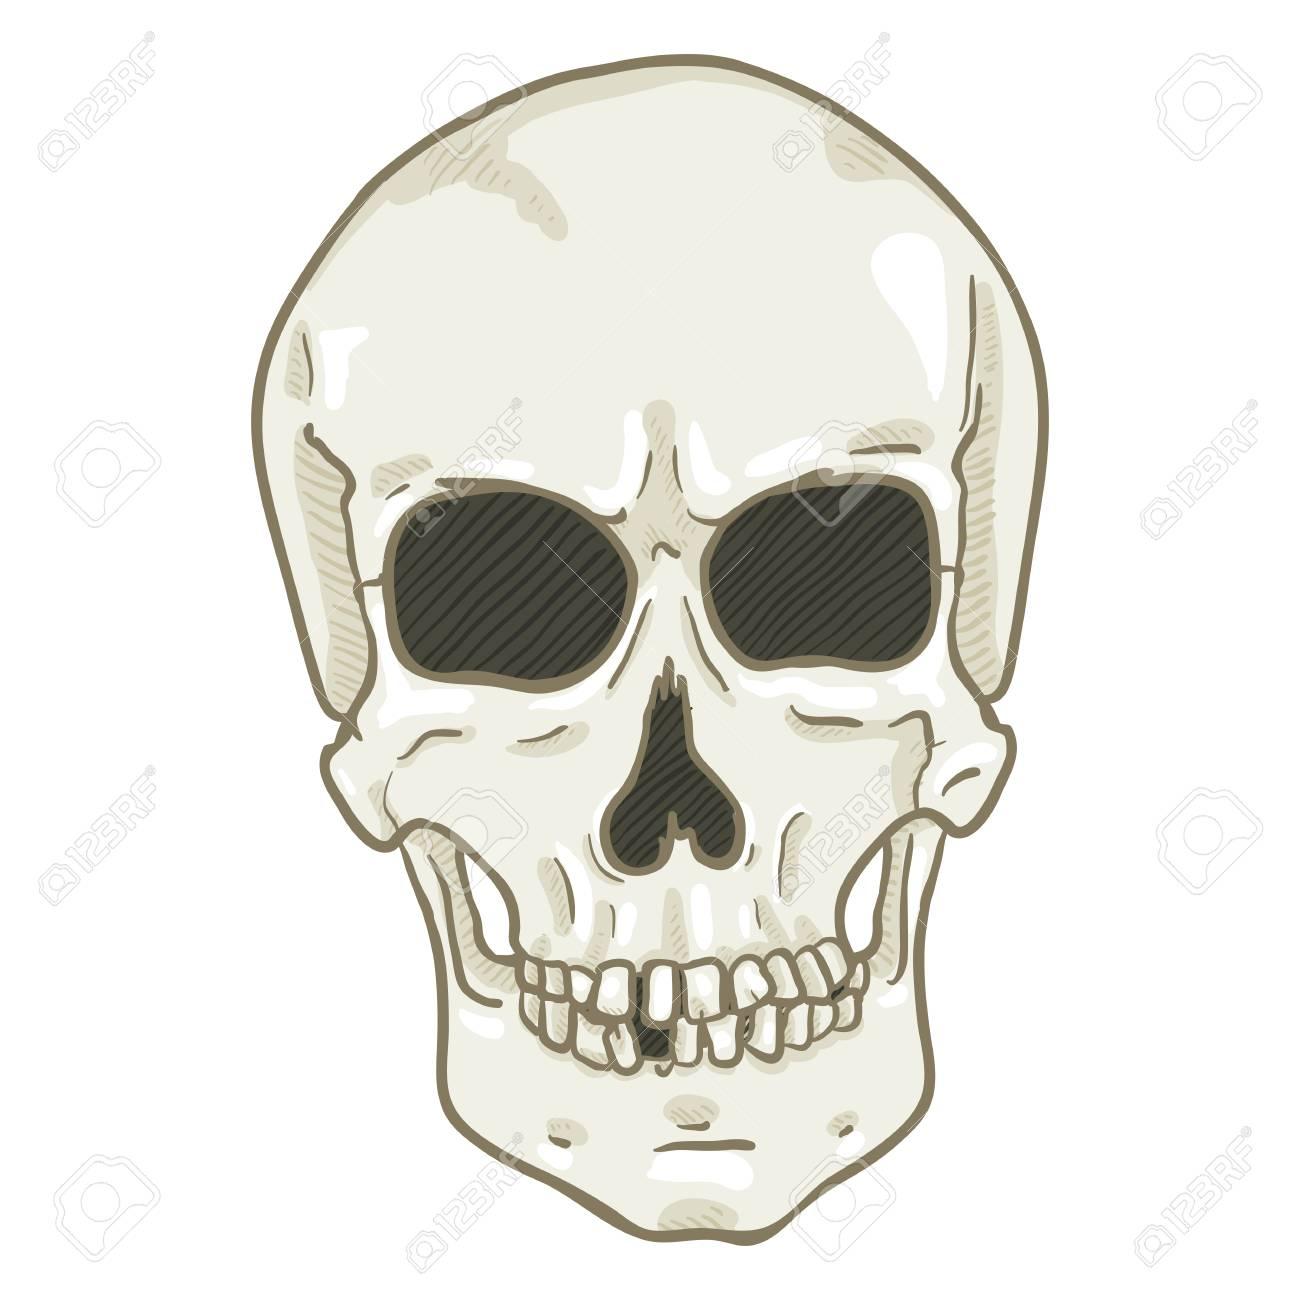 Vector Single Cartoon Illustration White Human Skull Front